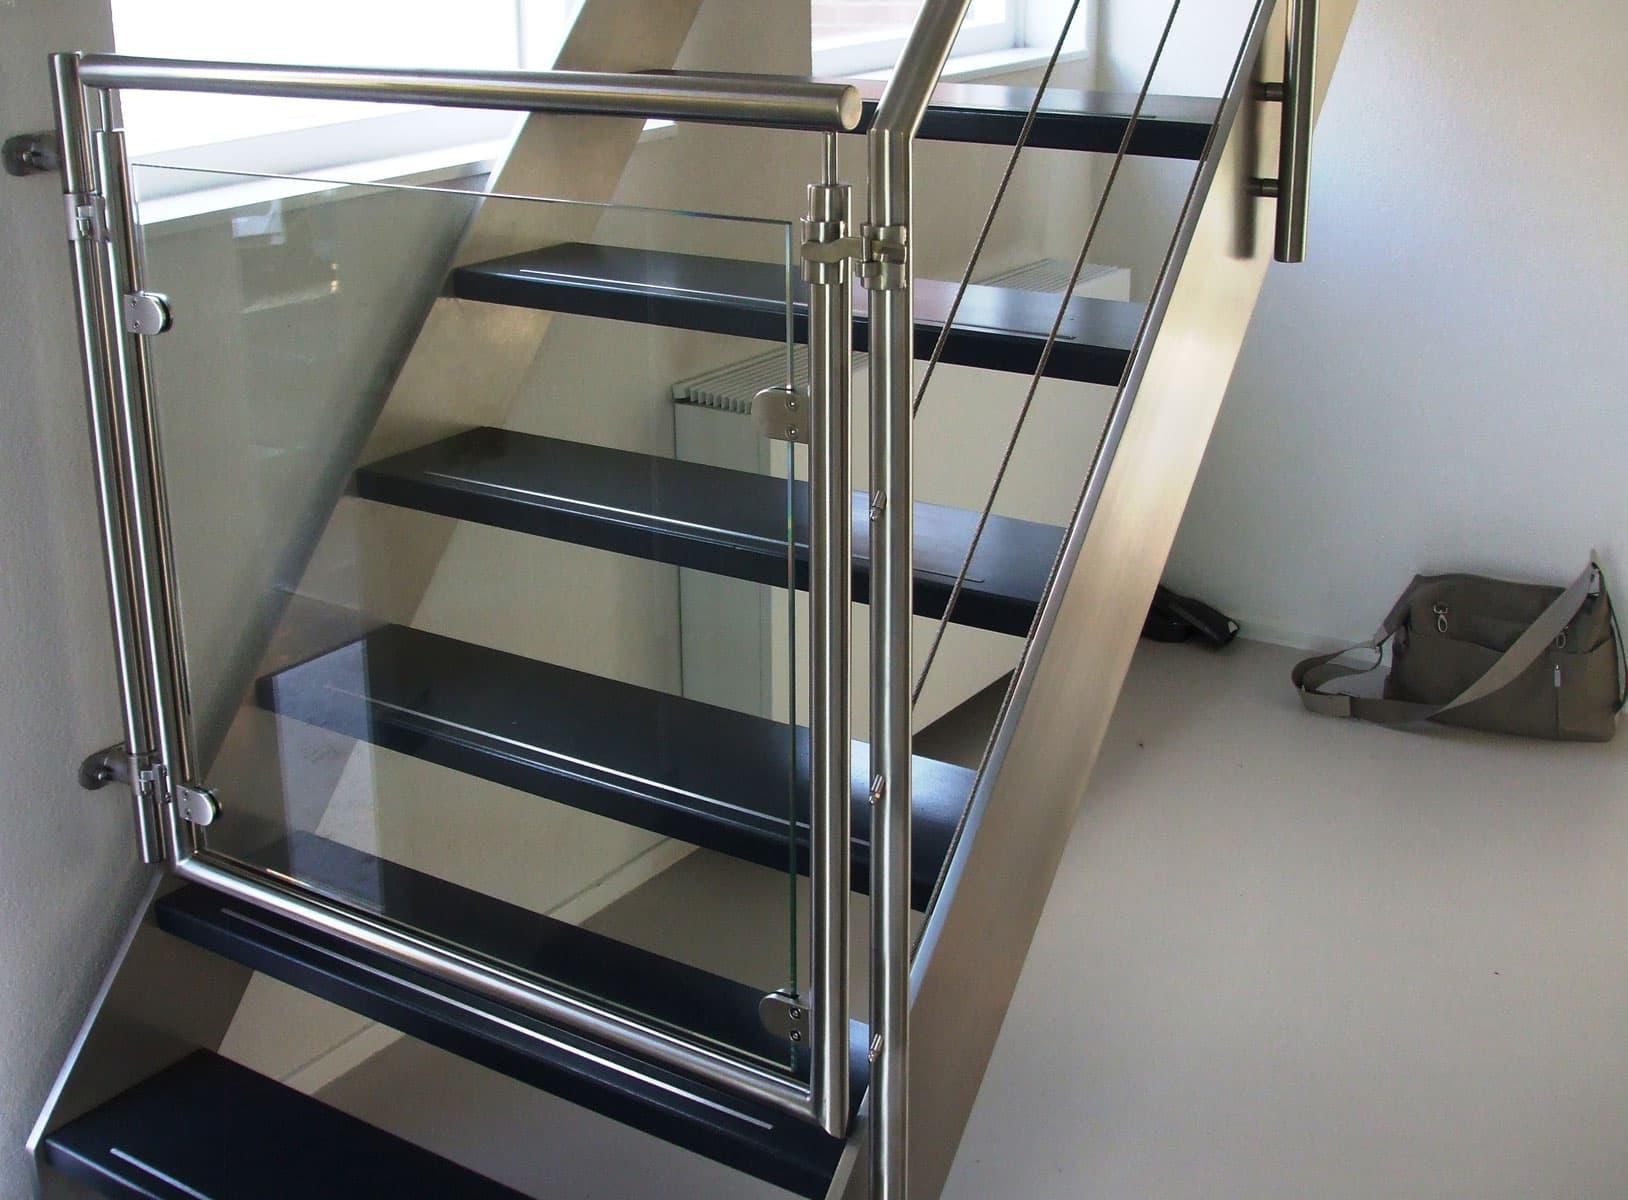 rt31d rechte trappen